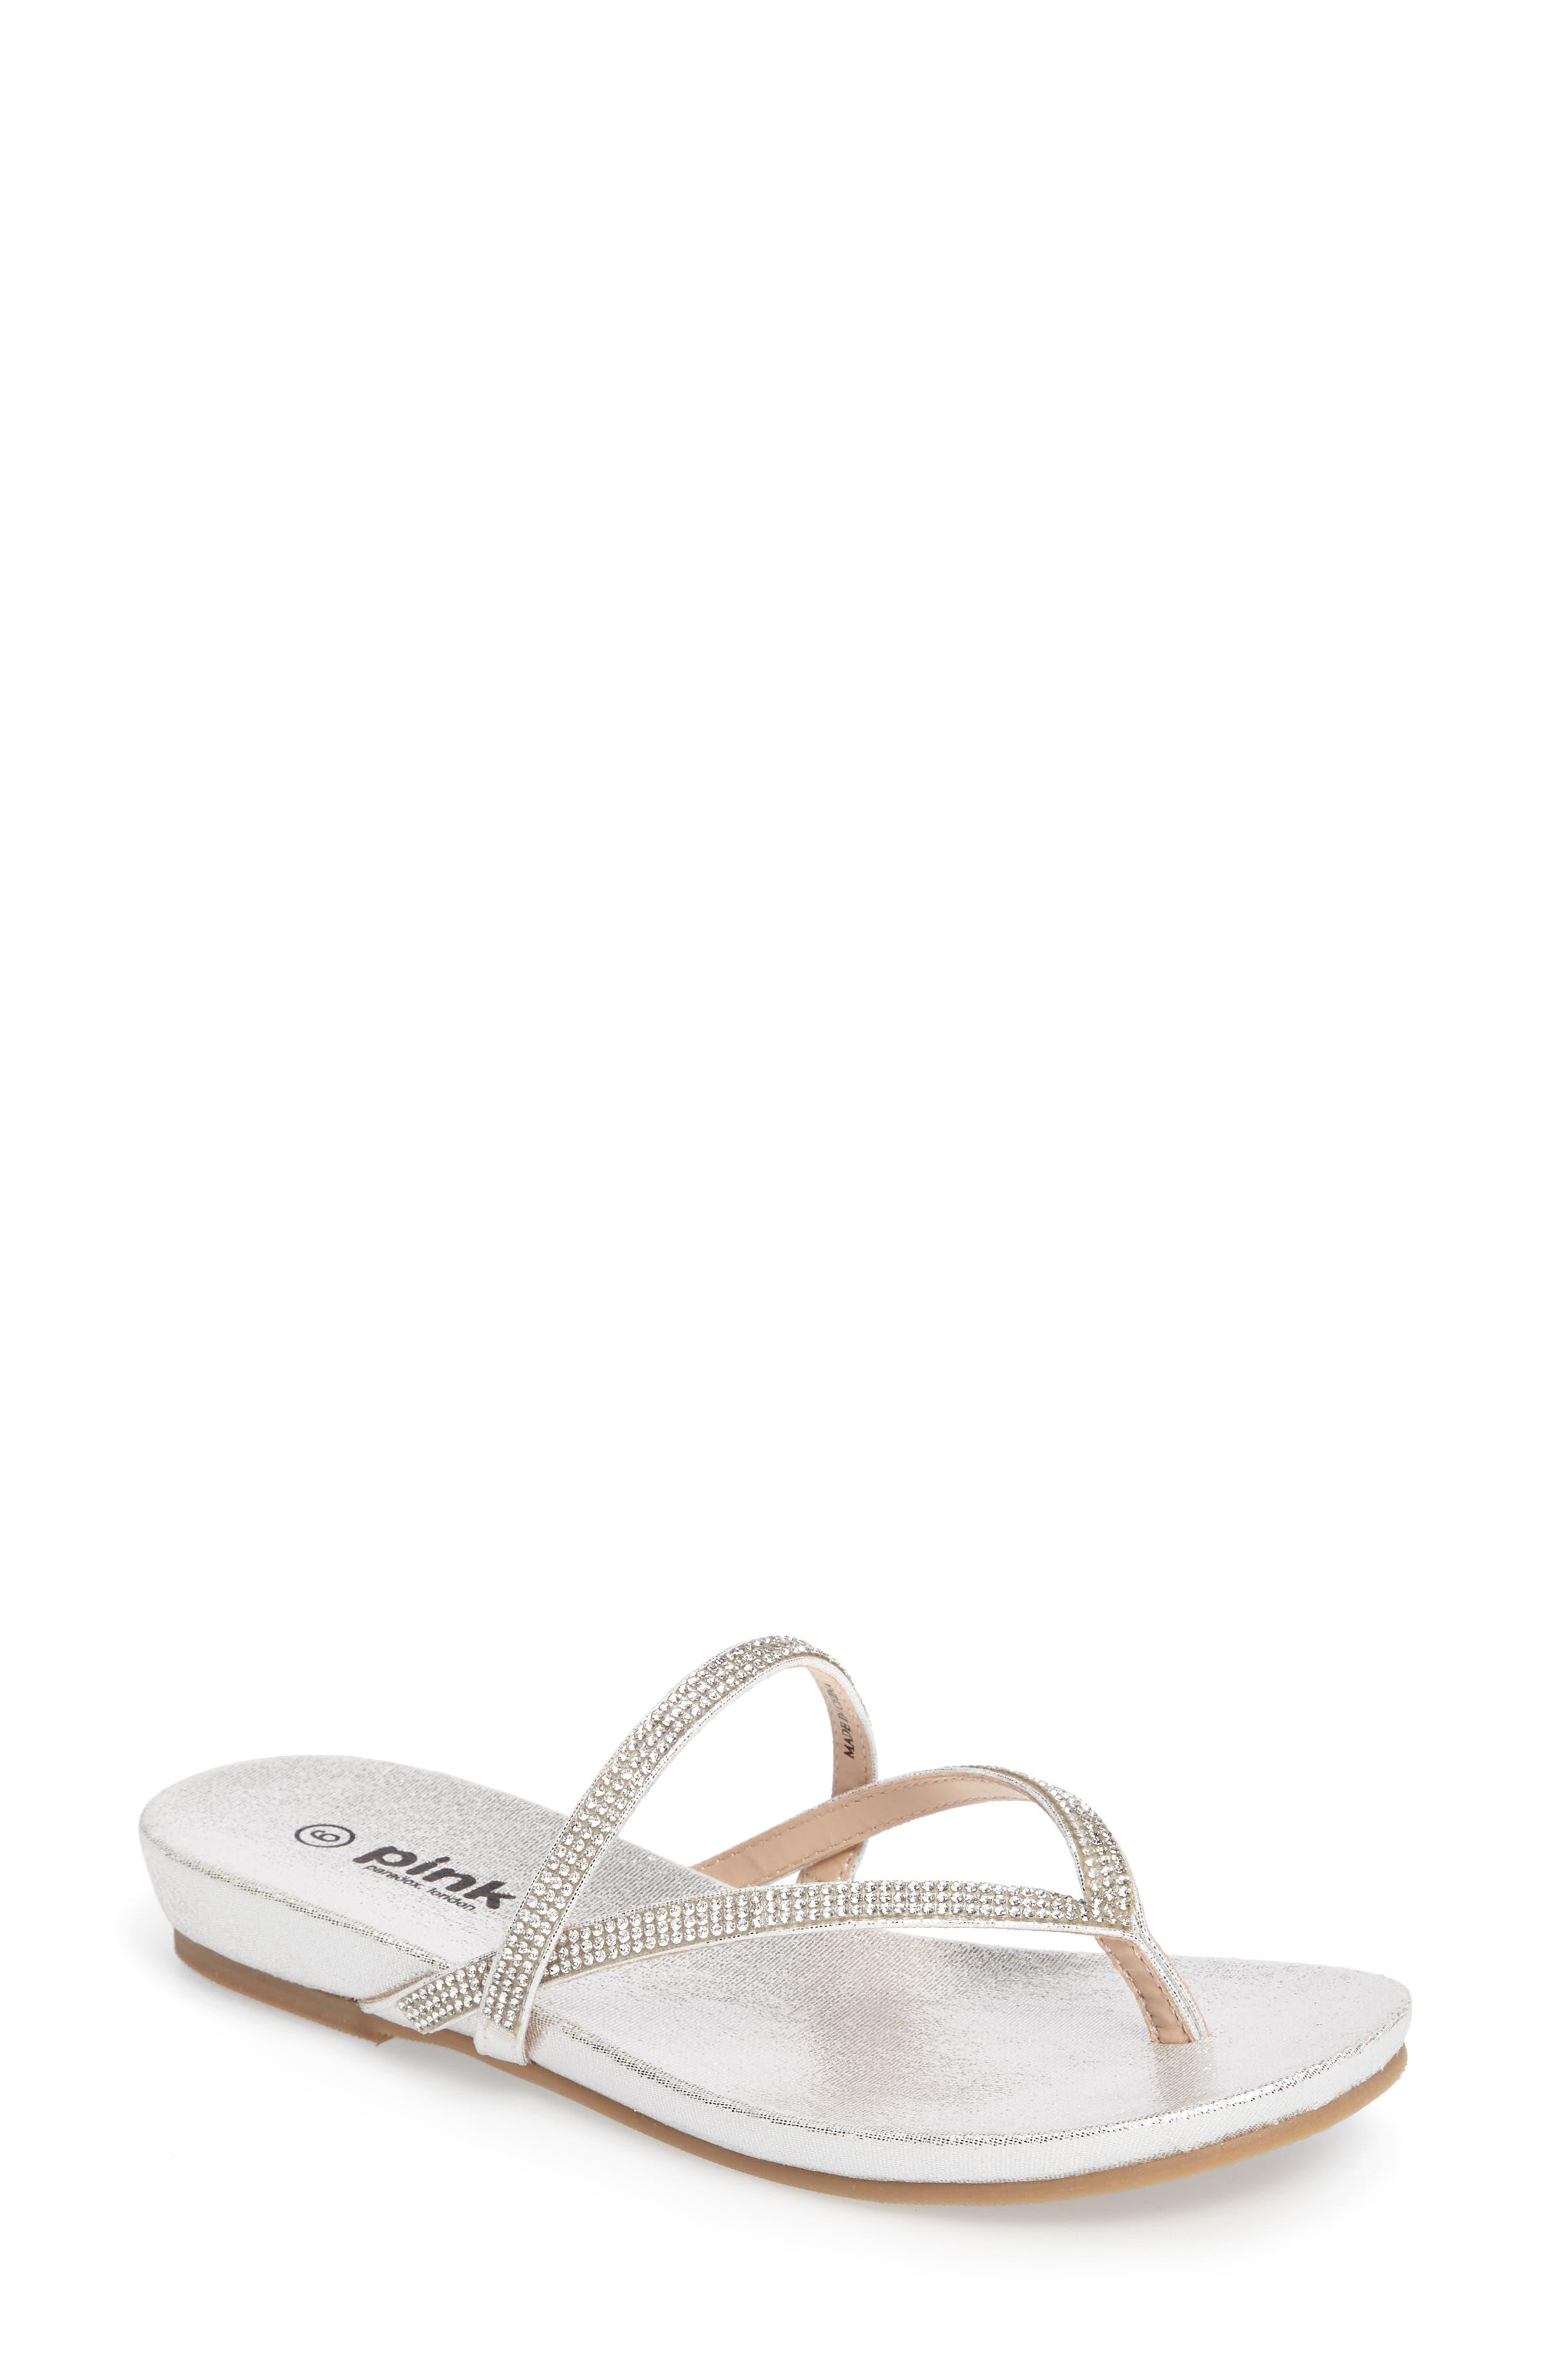 Athena Sandal,                         Main,                         color, Silver